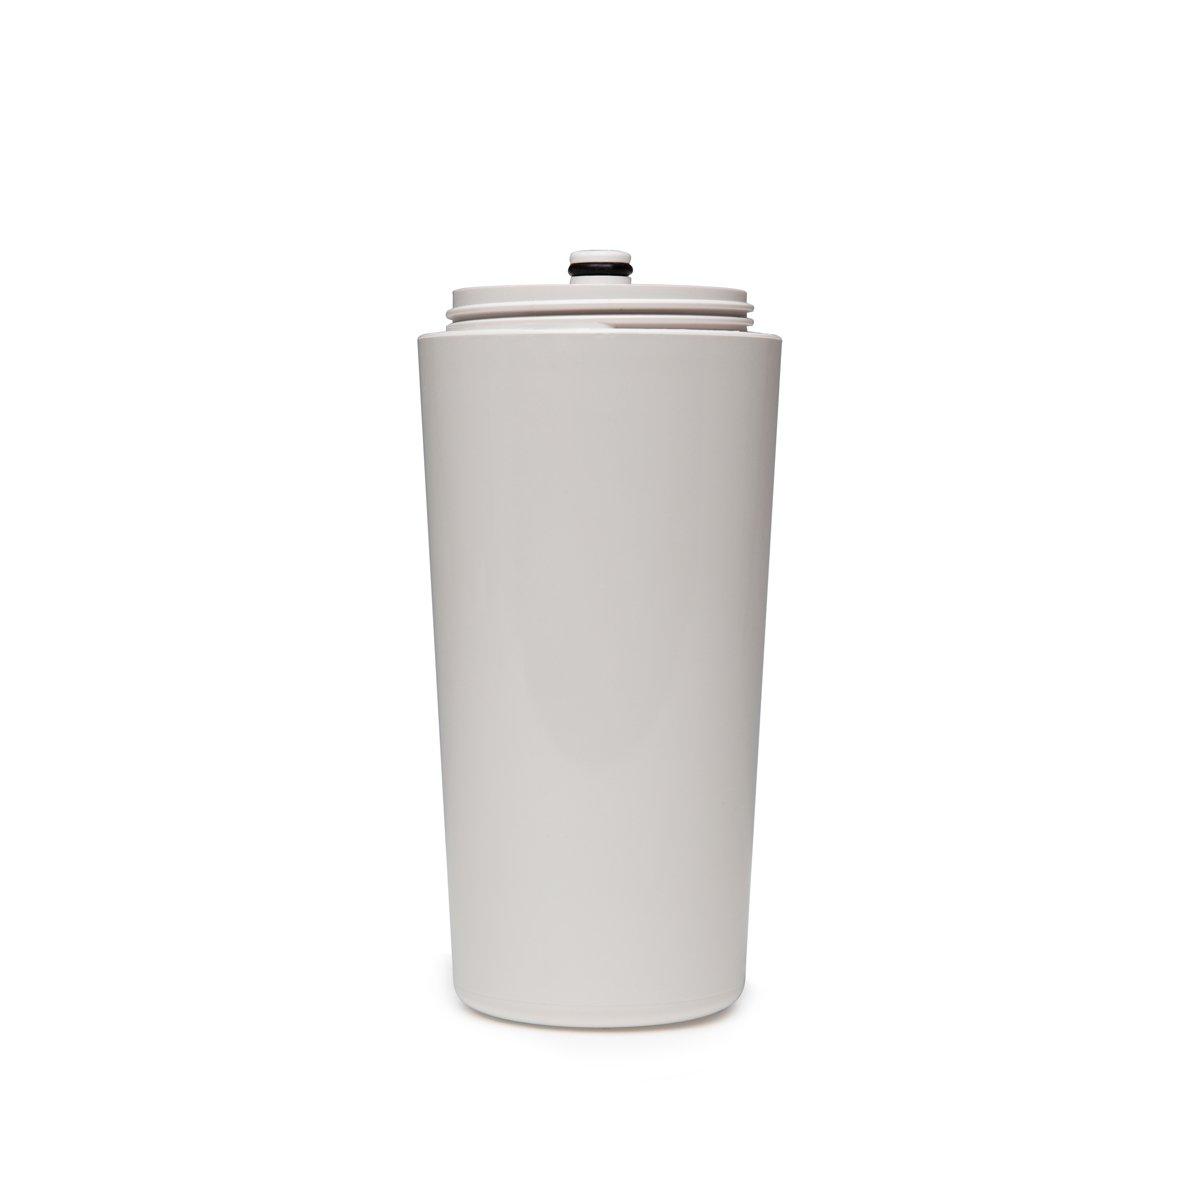 Aquasana Replacement Filter Cartridge for Shower Filters by Aquasana